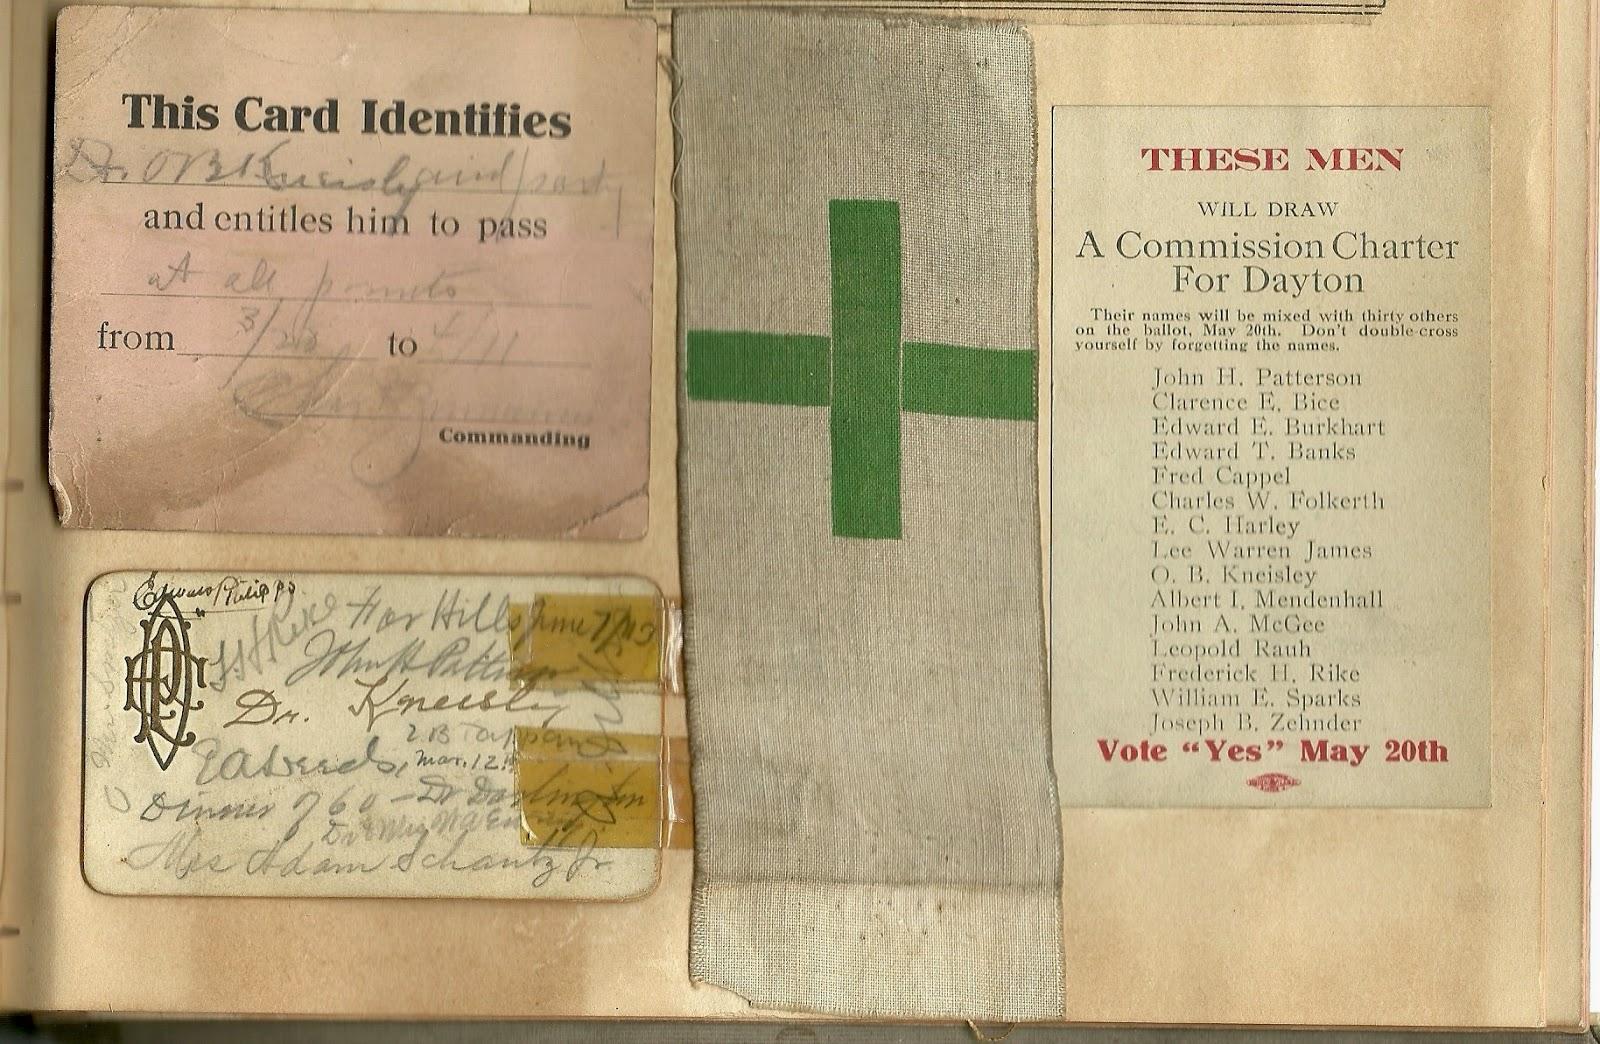 From Matt Yanney collection, 1913 Dayton Ohio flood scrapbook